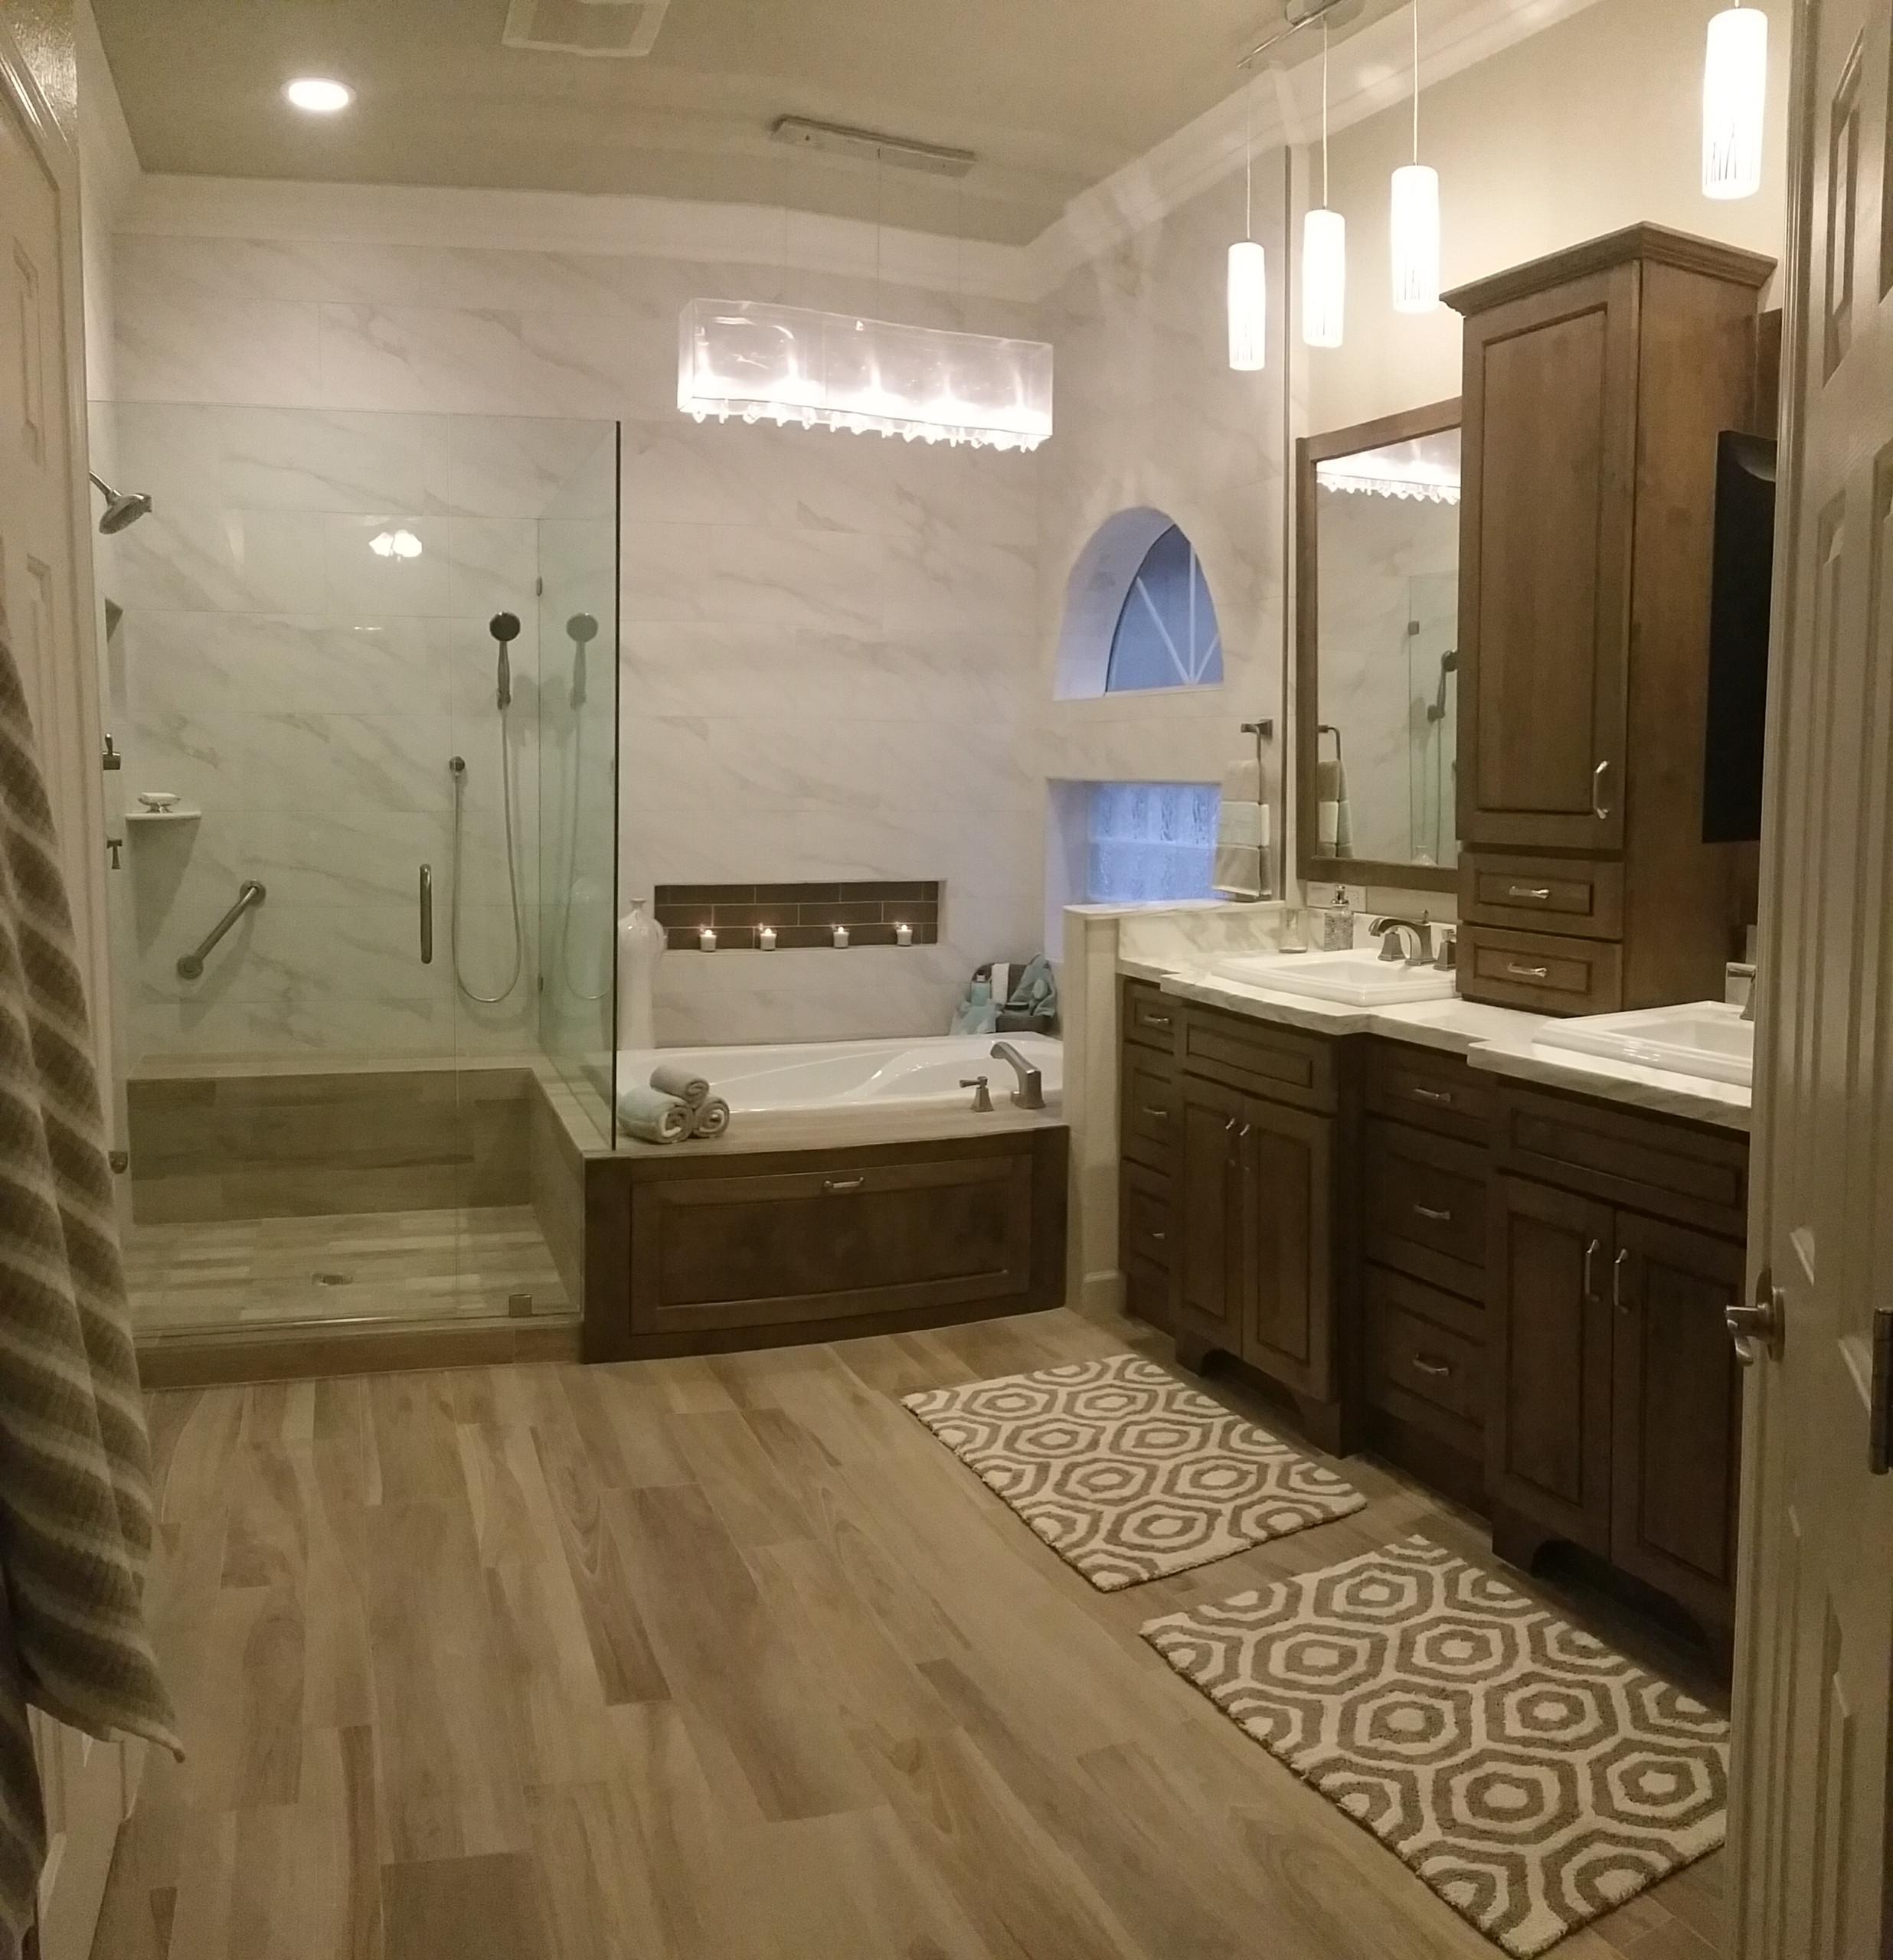 Master bath & bedroom remodel